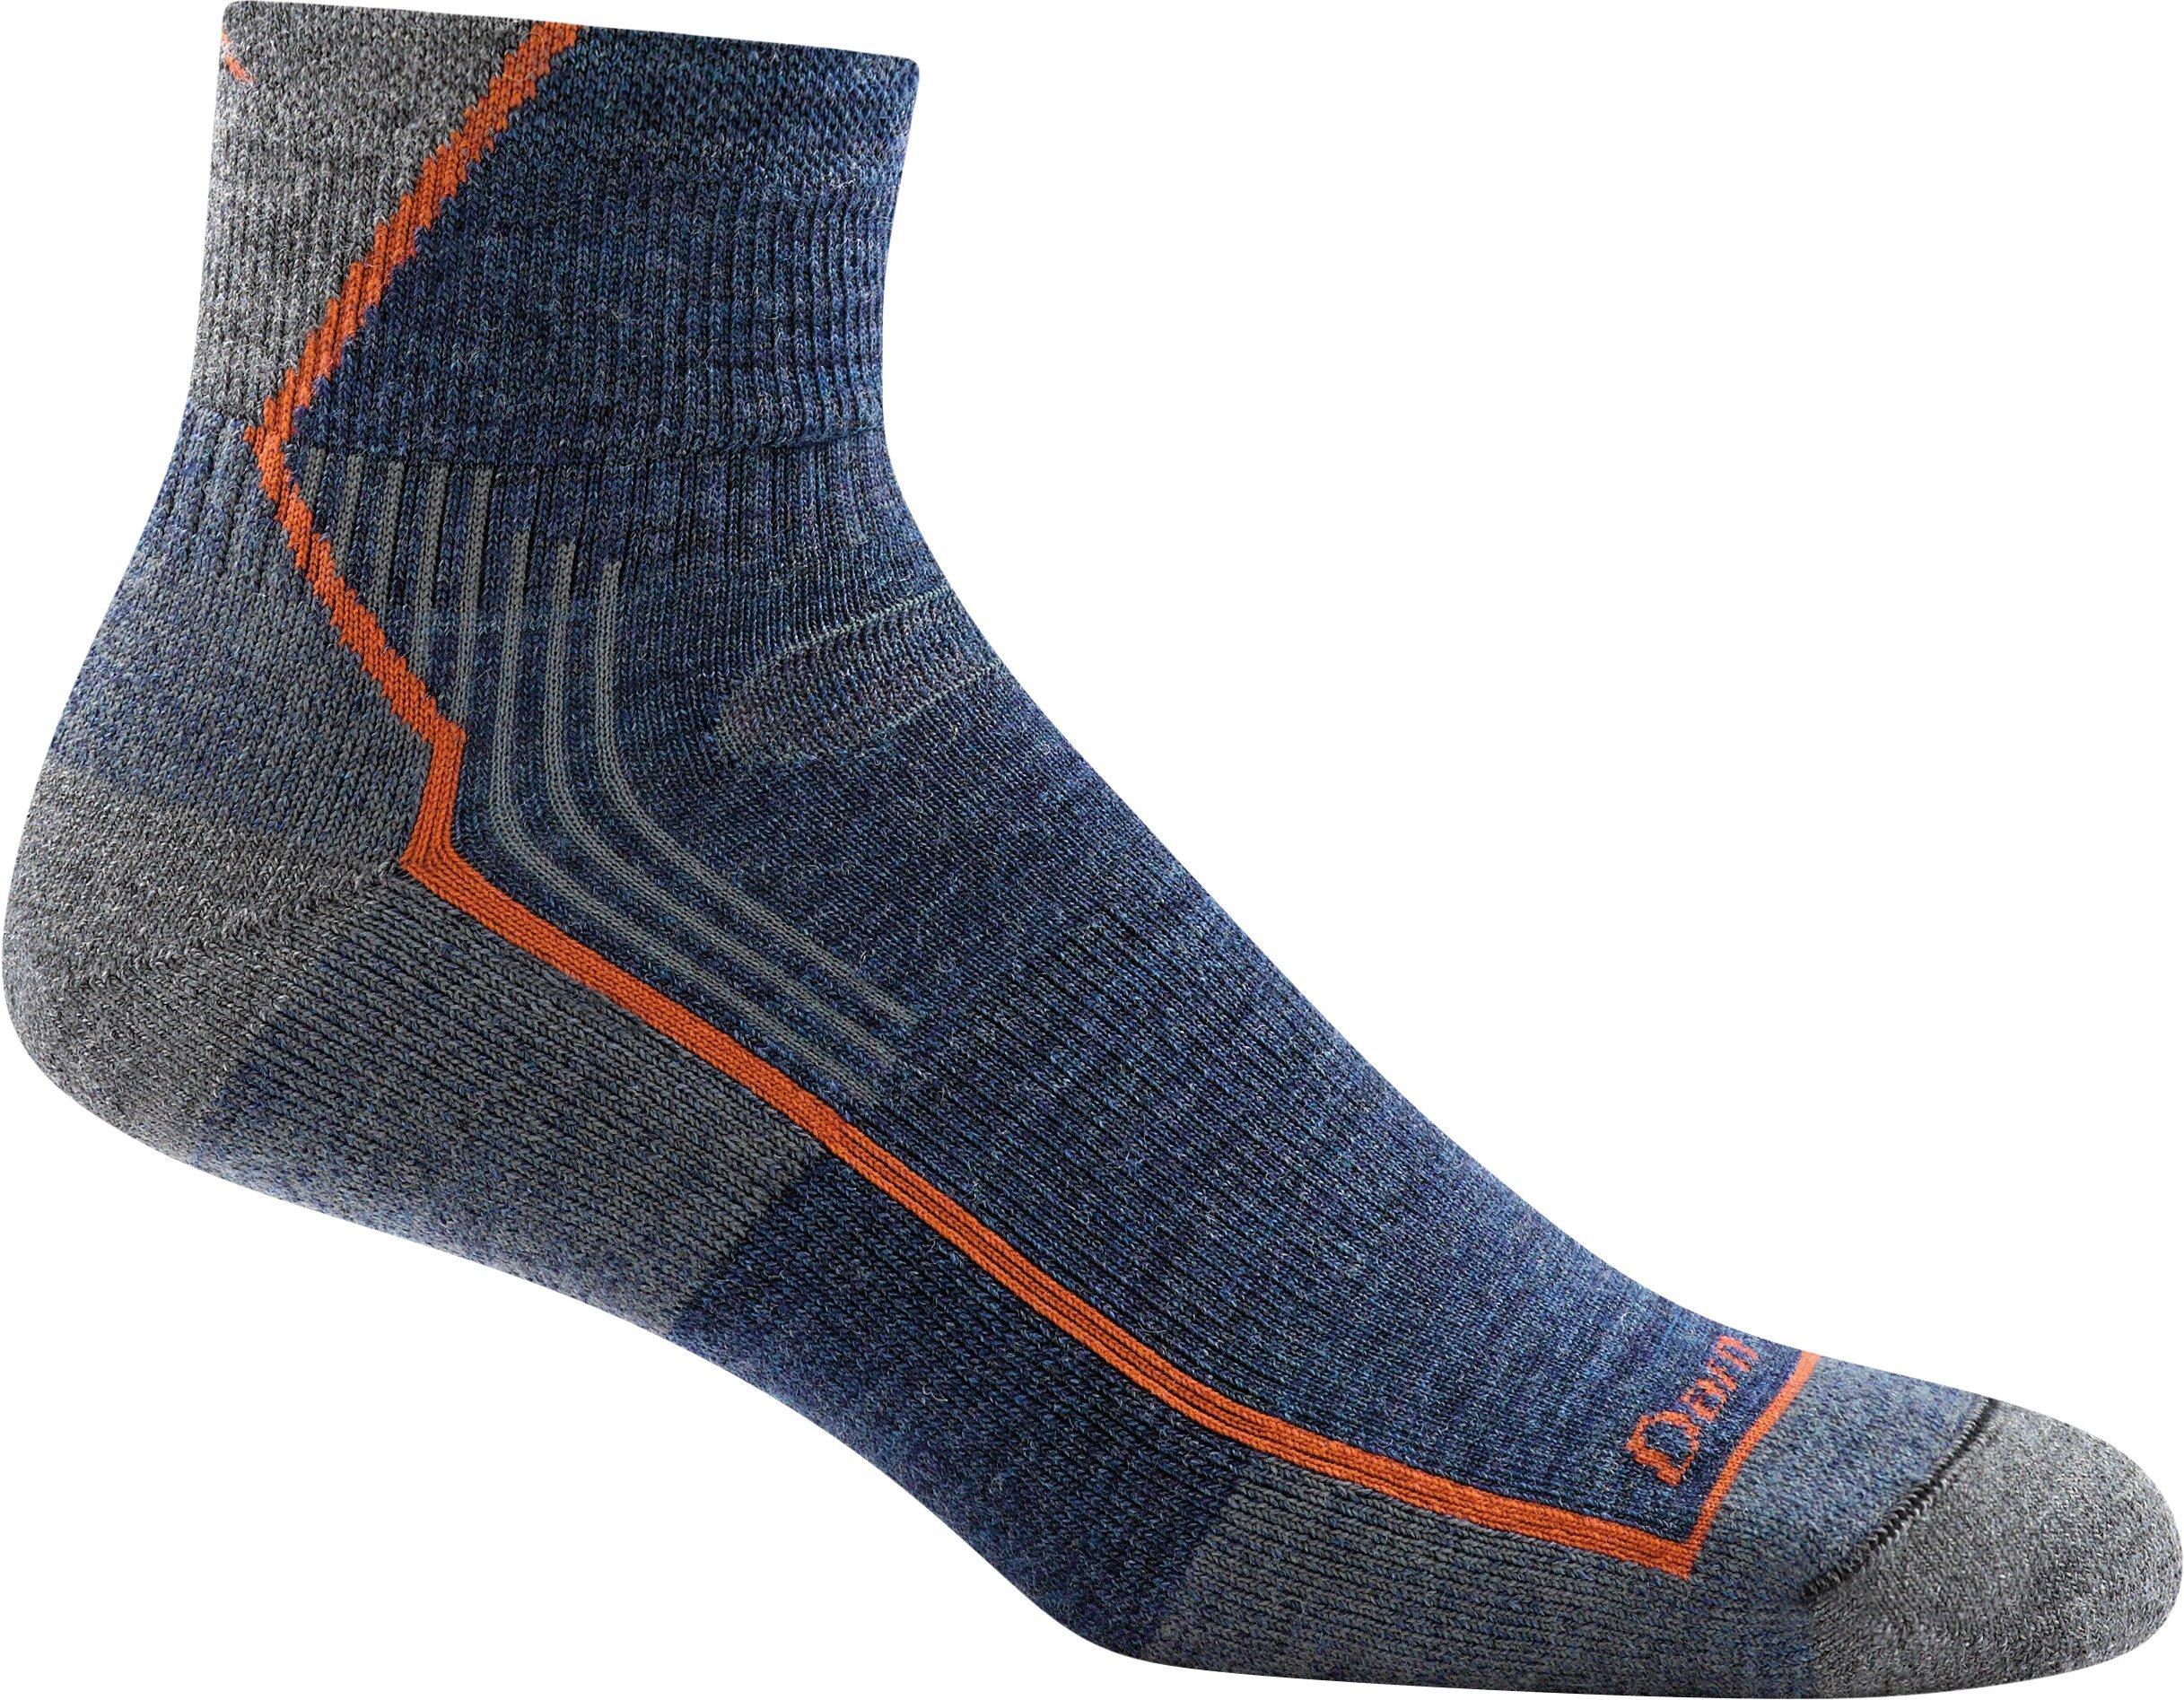 Darn Tough Men's Hiker 1/4 Sock Cushion (Style 1905) Merino Wool - 6 Pack Special (Denim, X-Large (12.5-14.5)) by Darn Tough